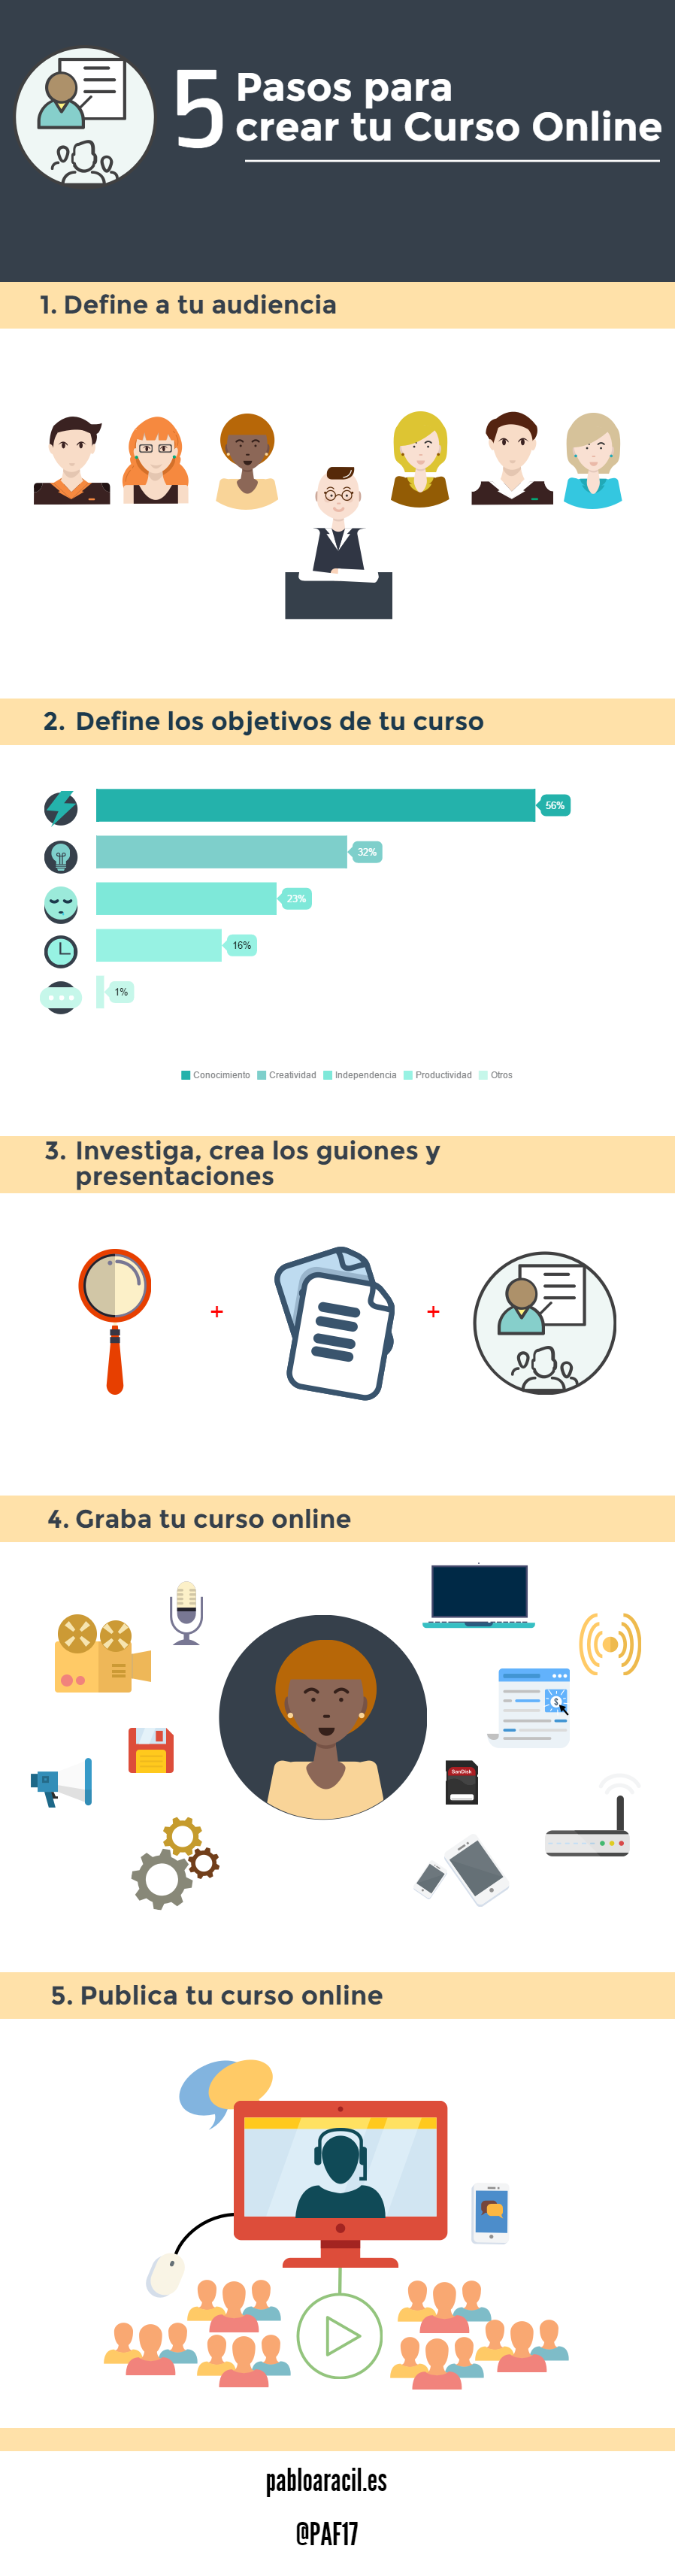 5 pasos para crear cursos online